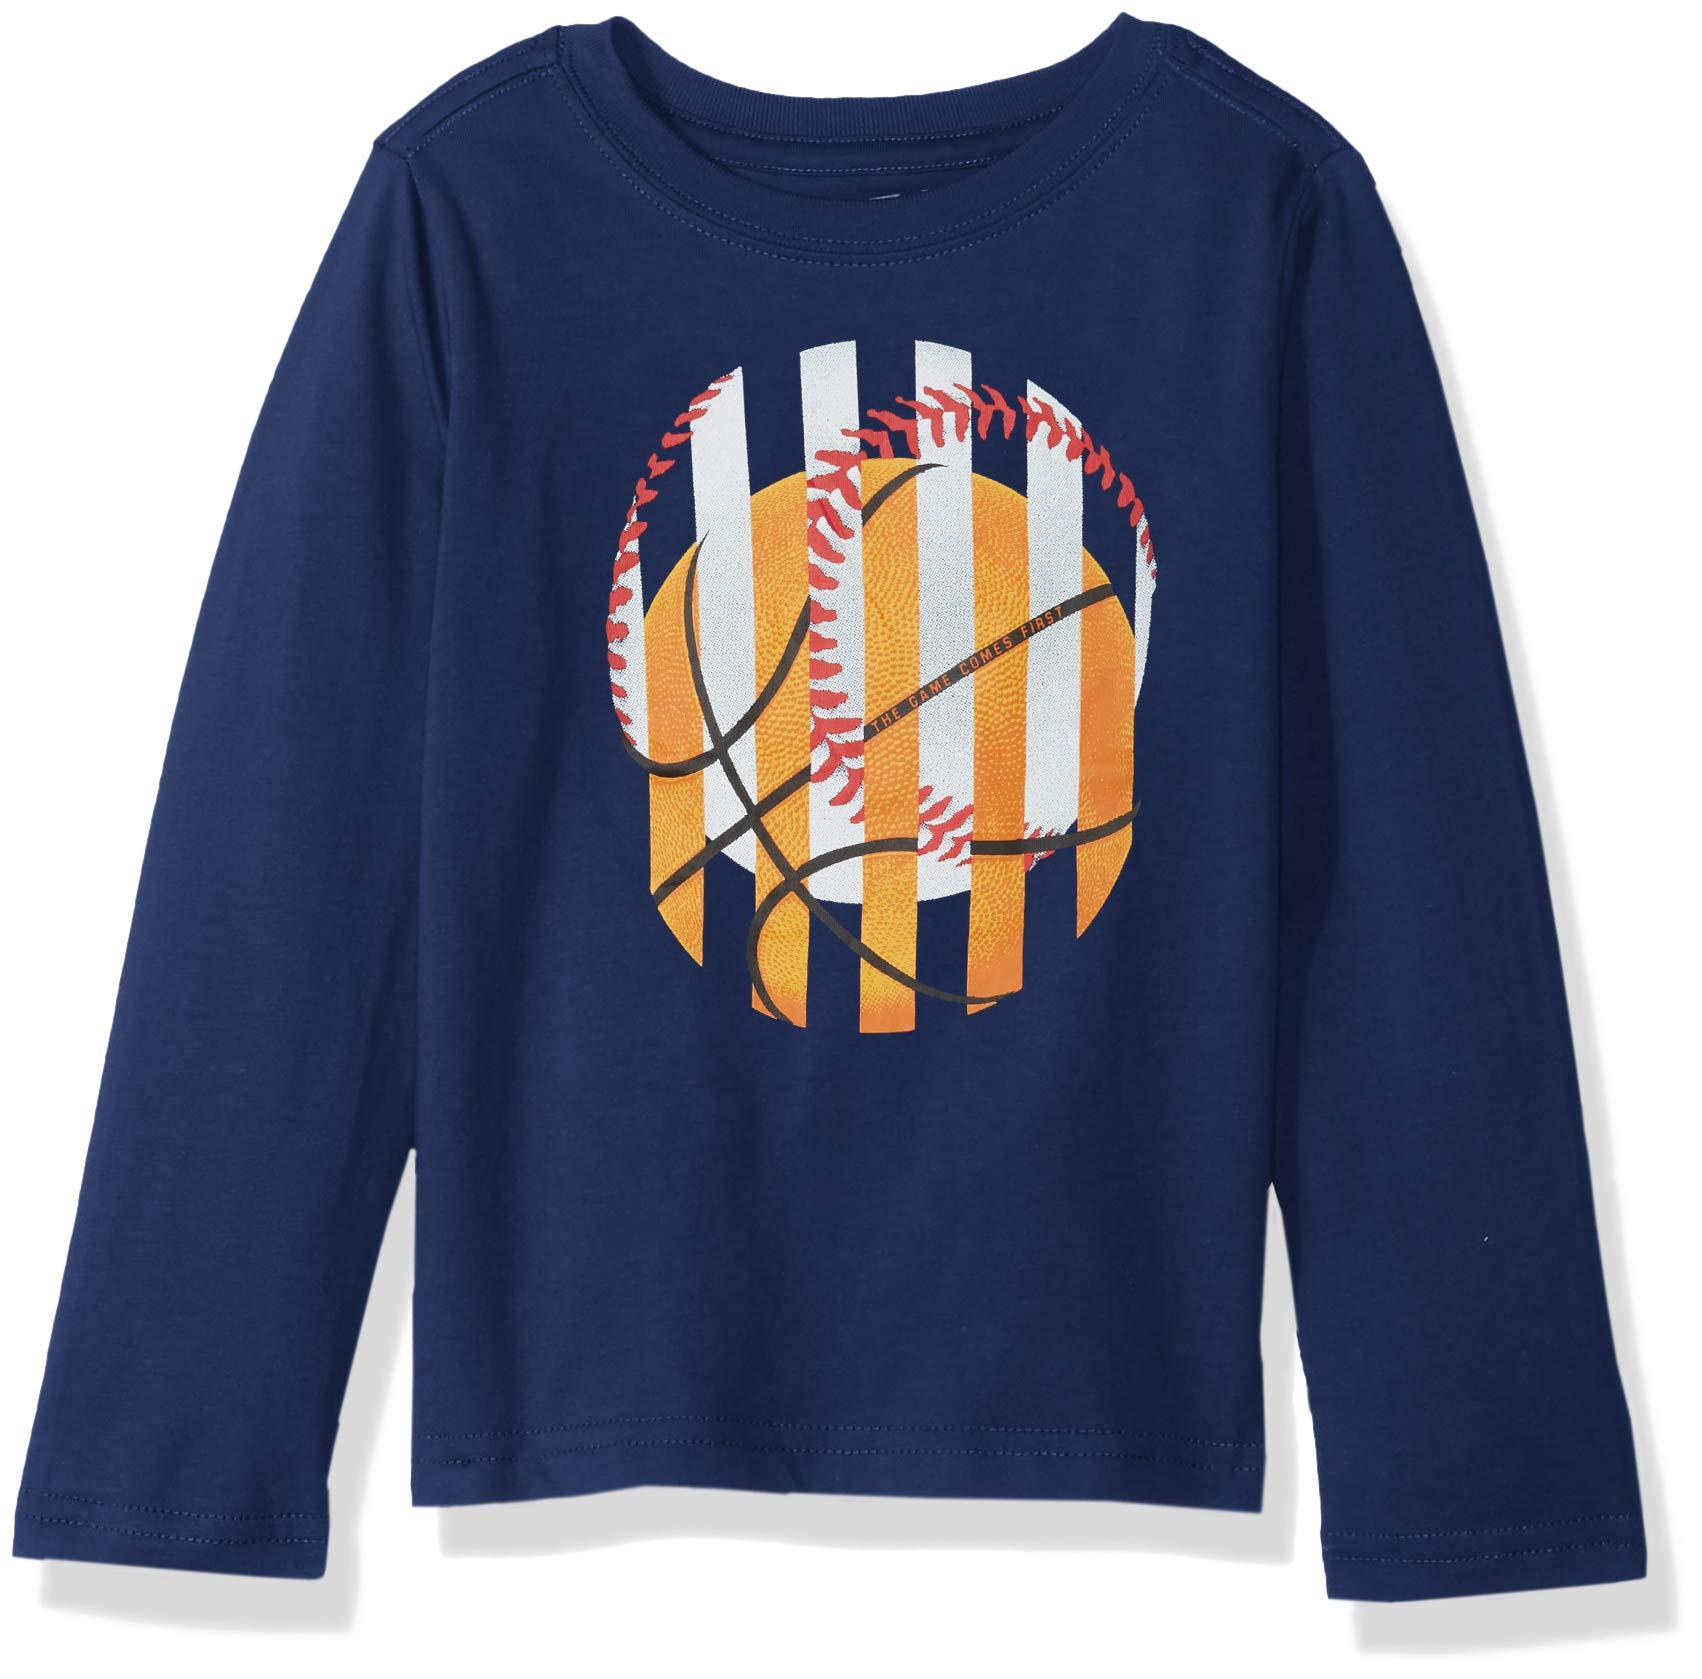 Crazy 8 Boys Long Sleeve Graphic Tee, Navy Sports Balls, S